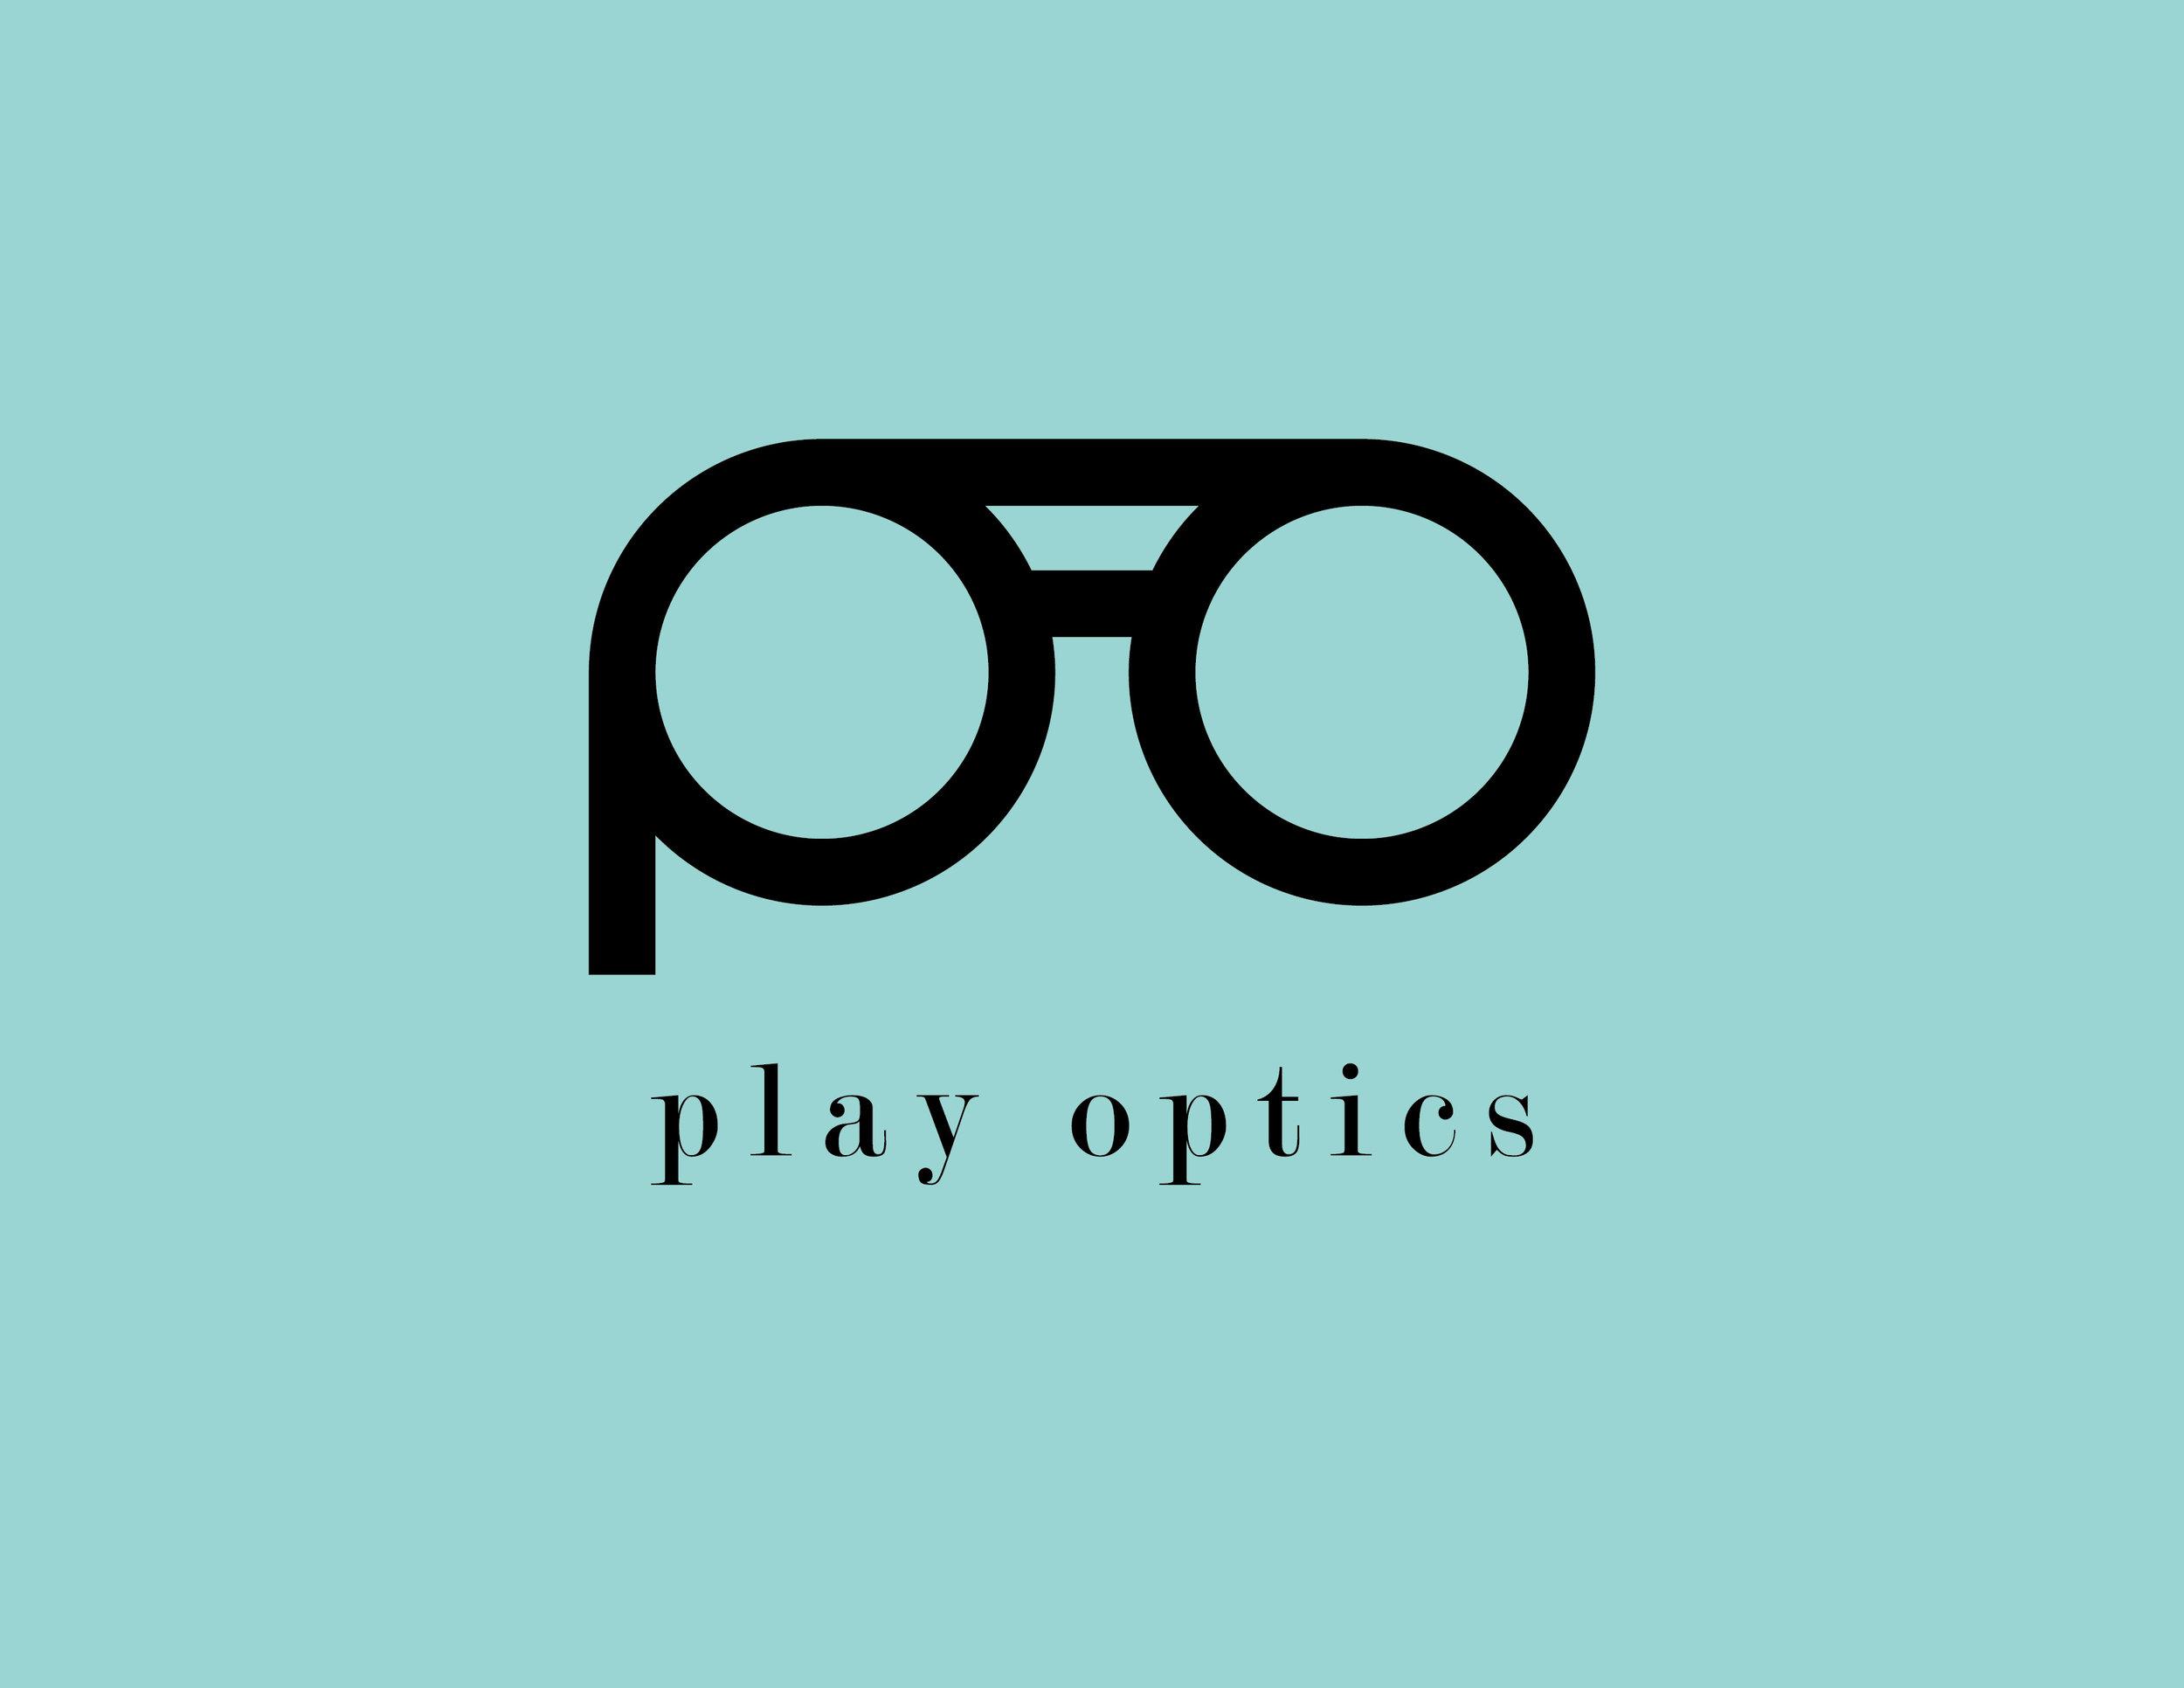 play_optics.jpg